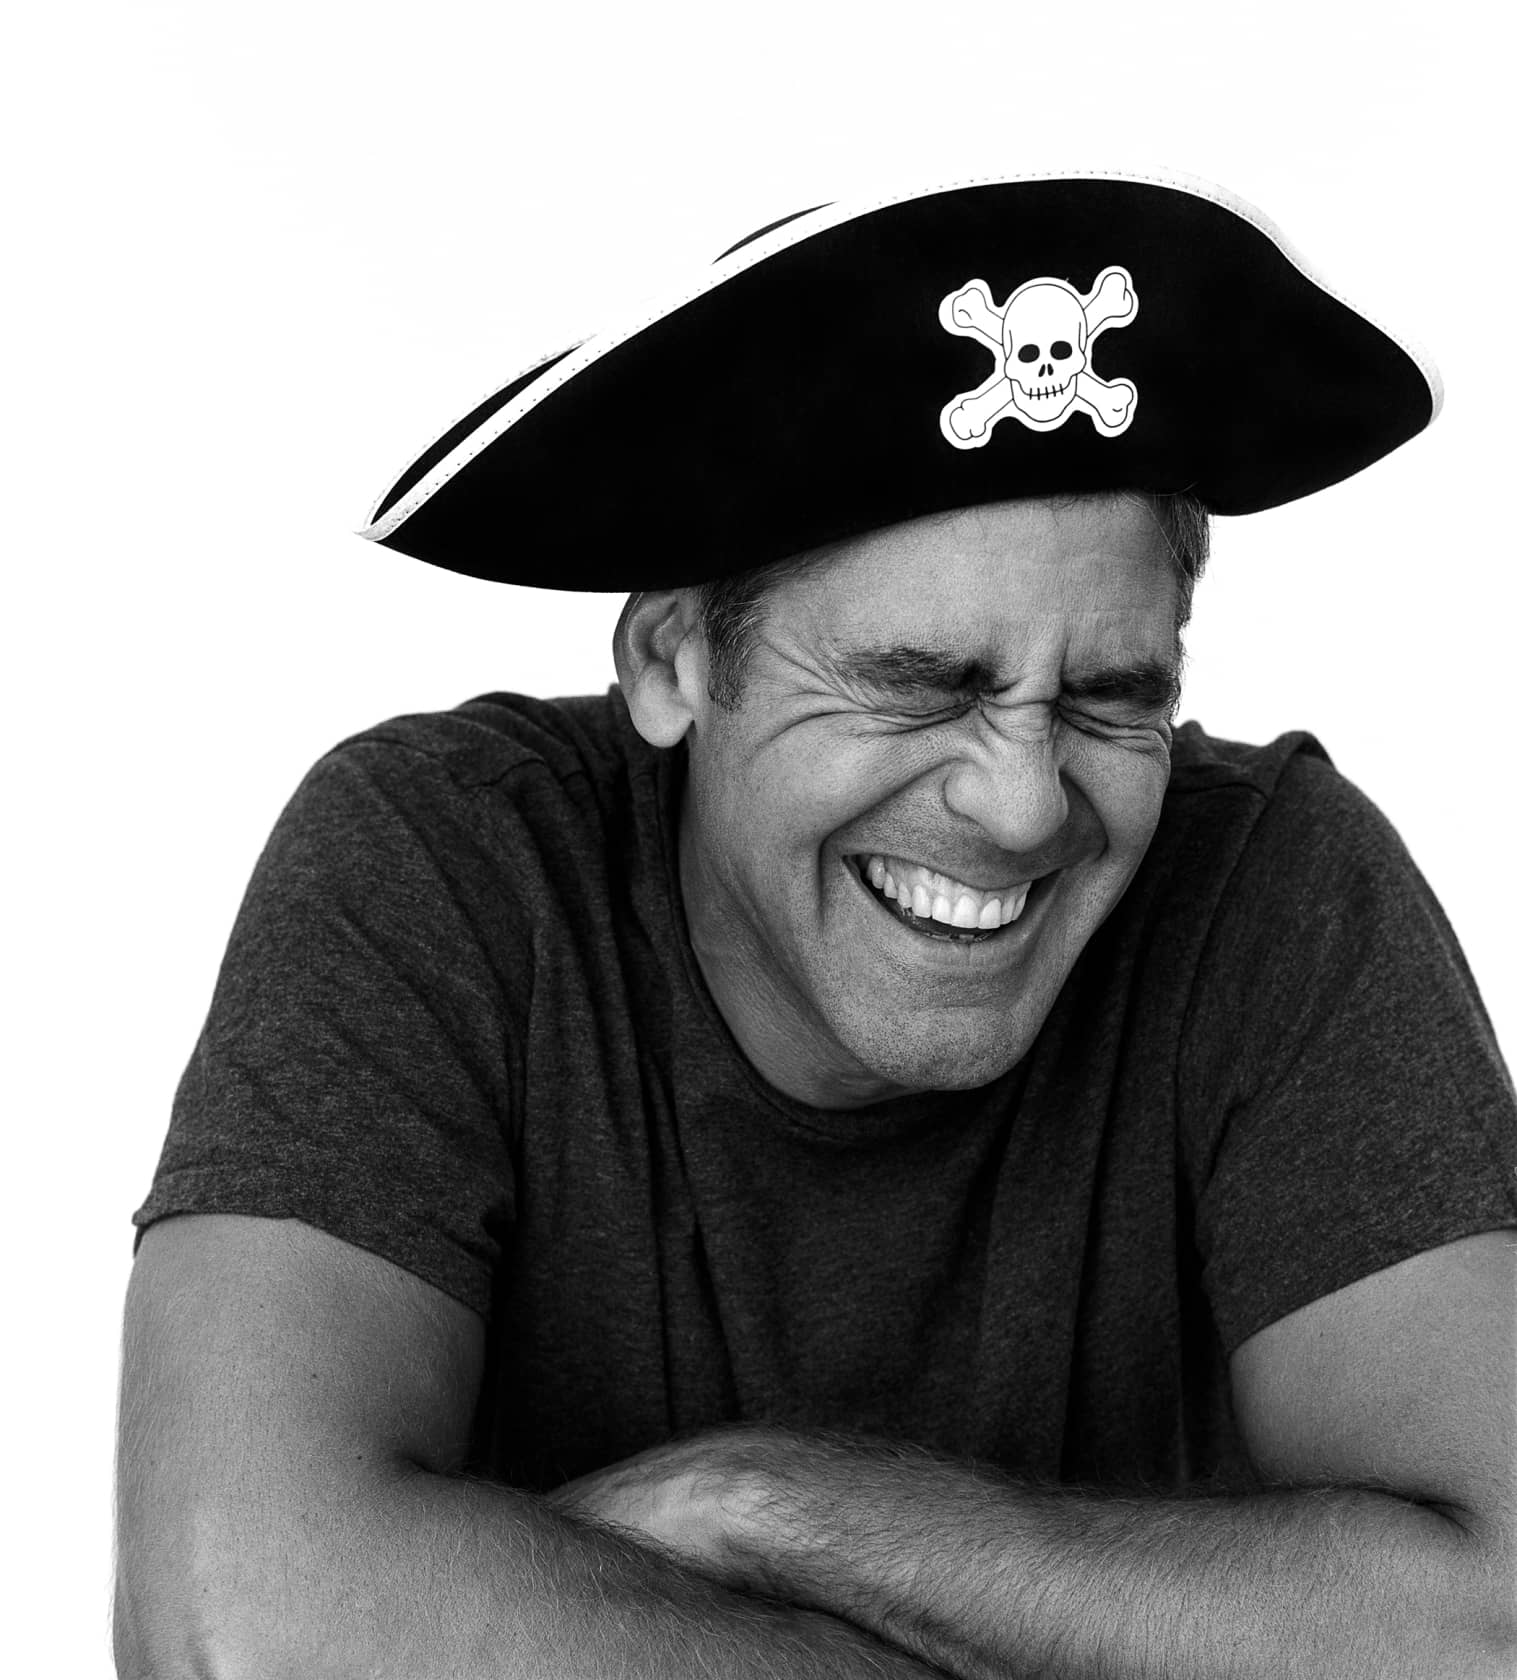 Andy Gotts George Clooney Fine Art Giclée Archival Print